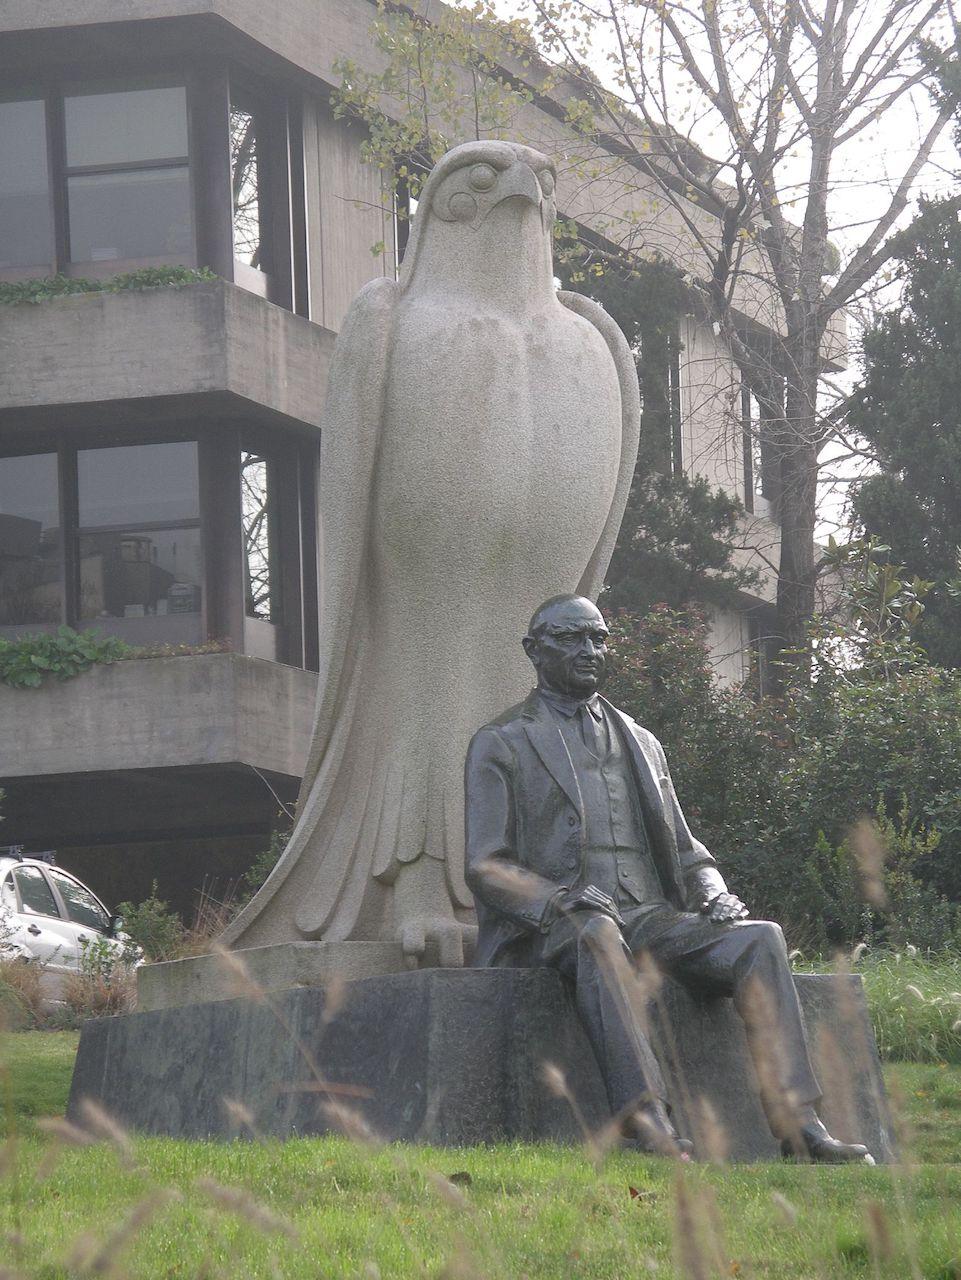 Photograph of statue of Gulbenkian, overseen by Horus, in the garden, Lisbon.